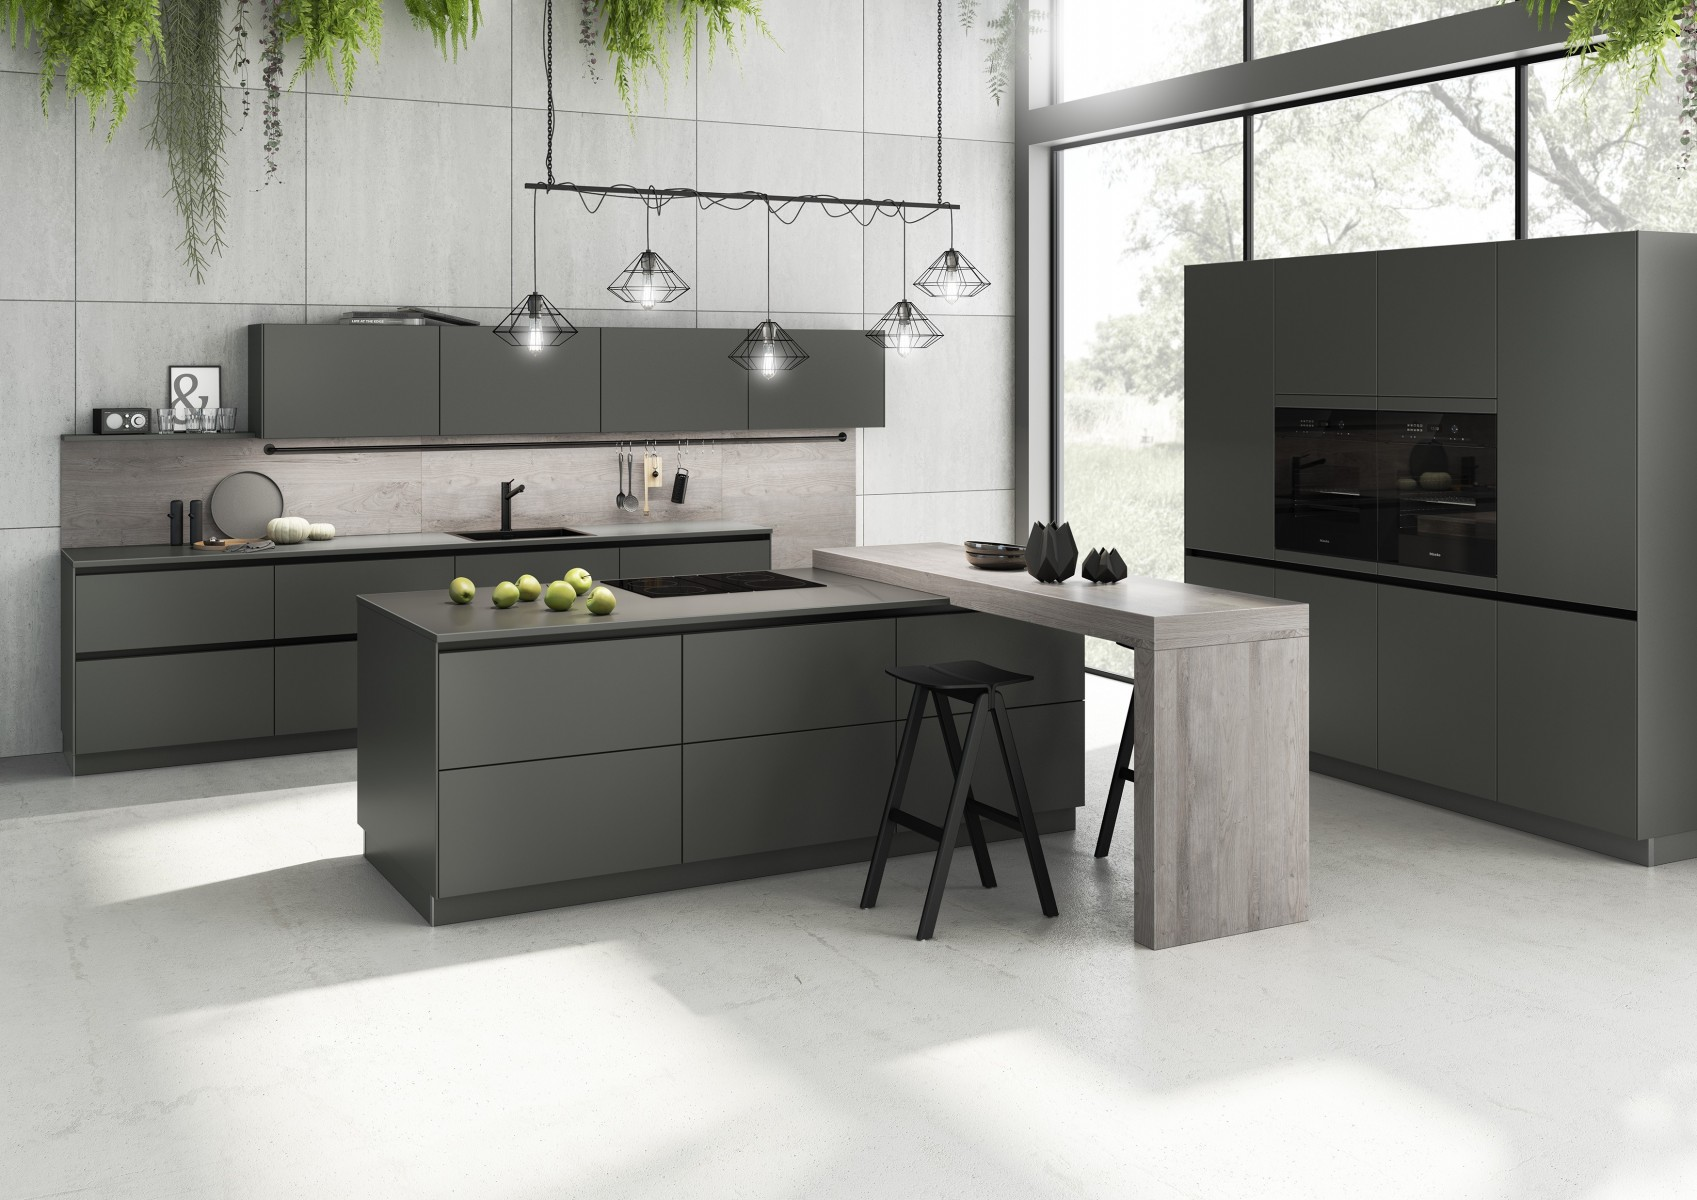 Artego Küche modern